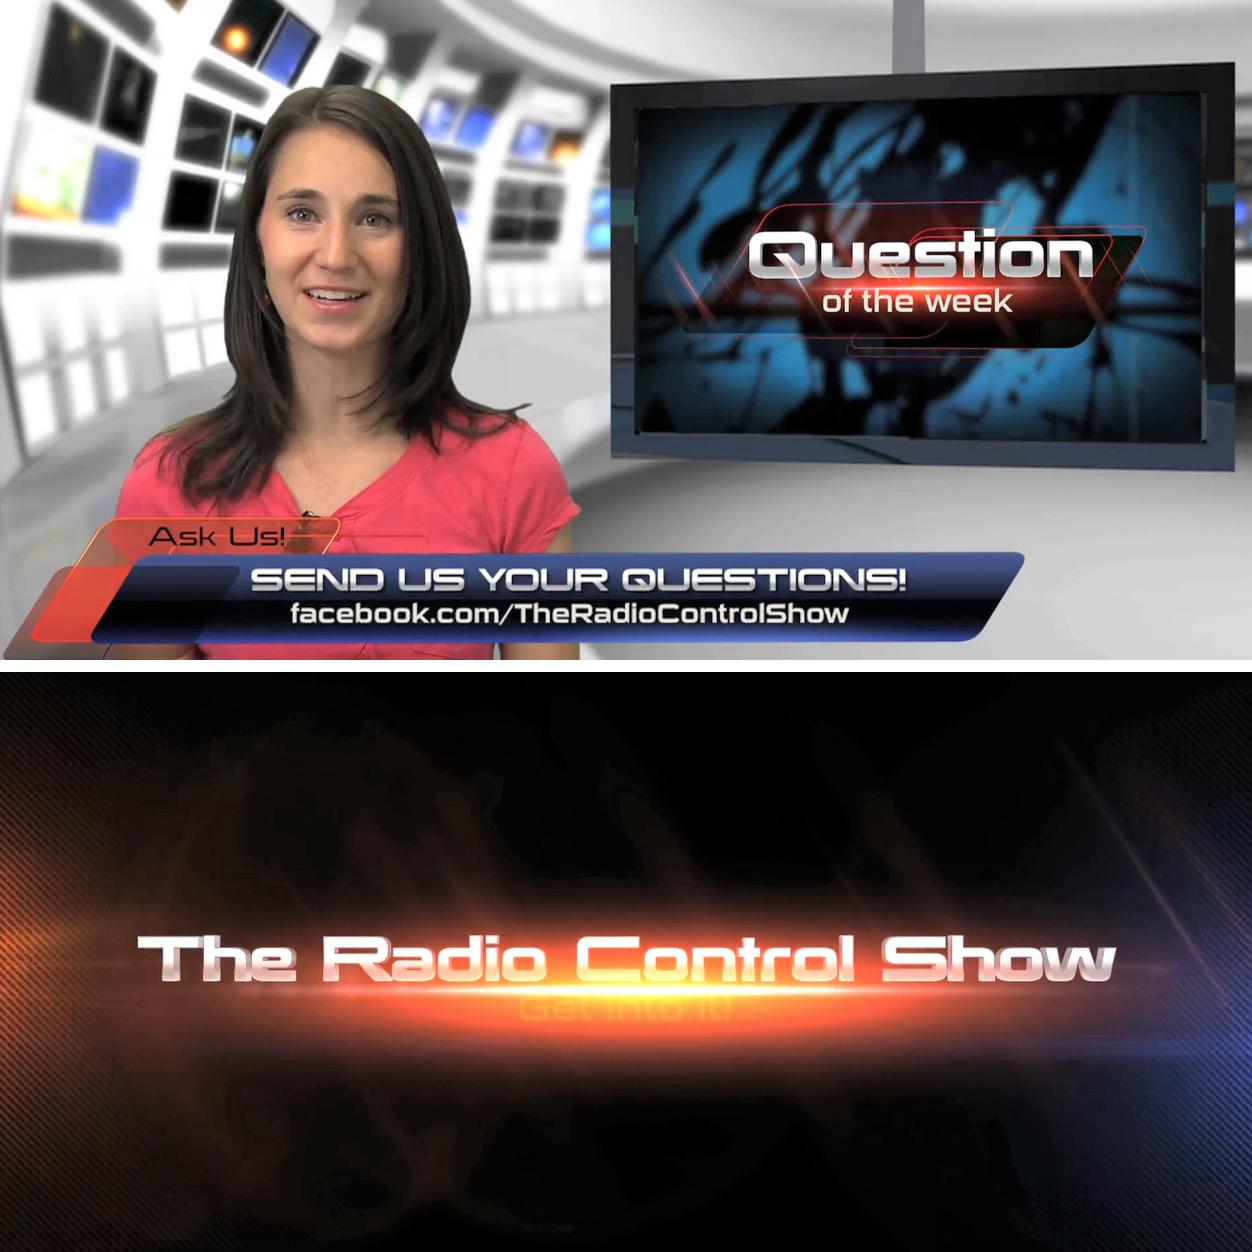 The Radio Control Show 165